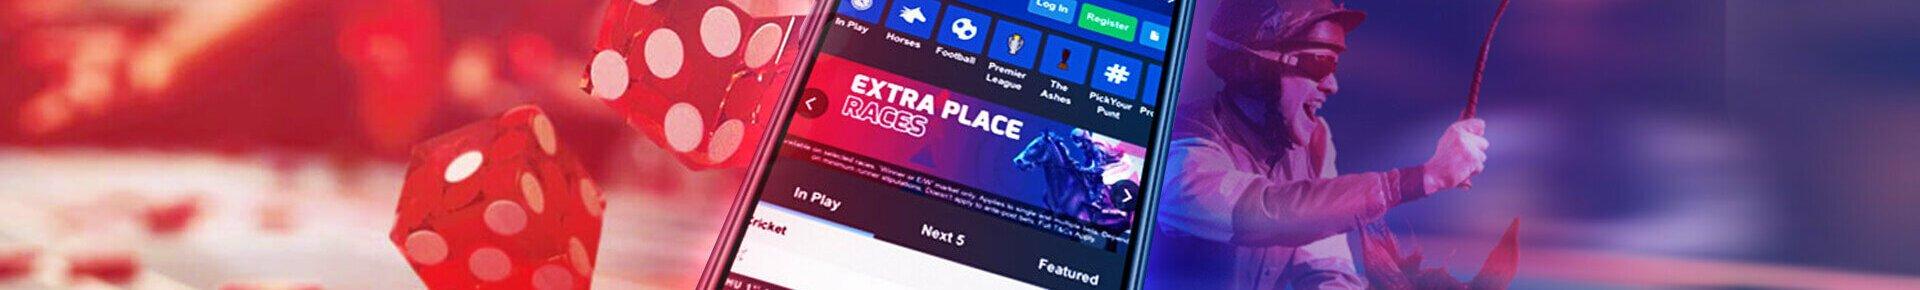 Betfred casino review UK